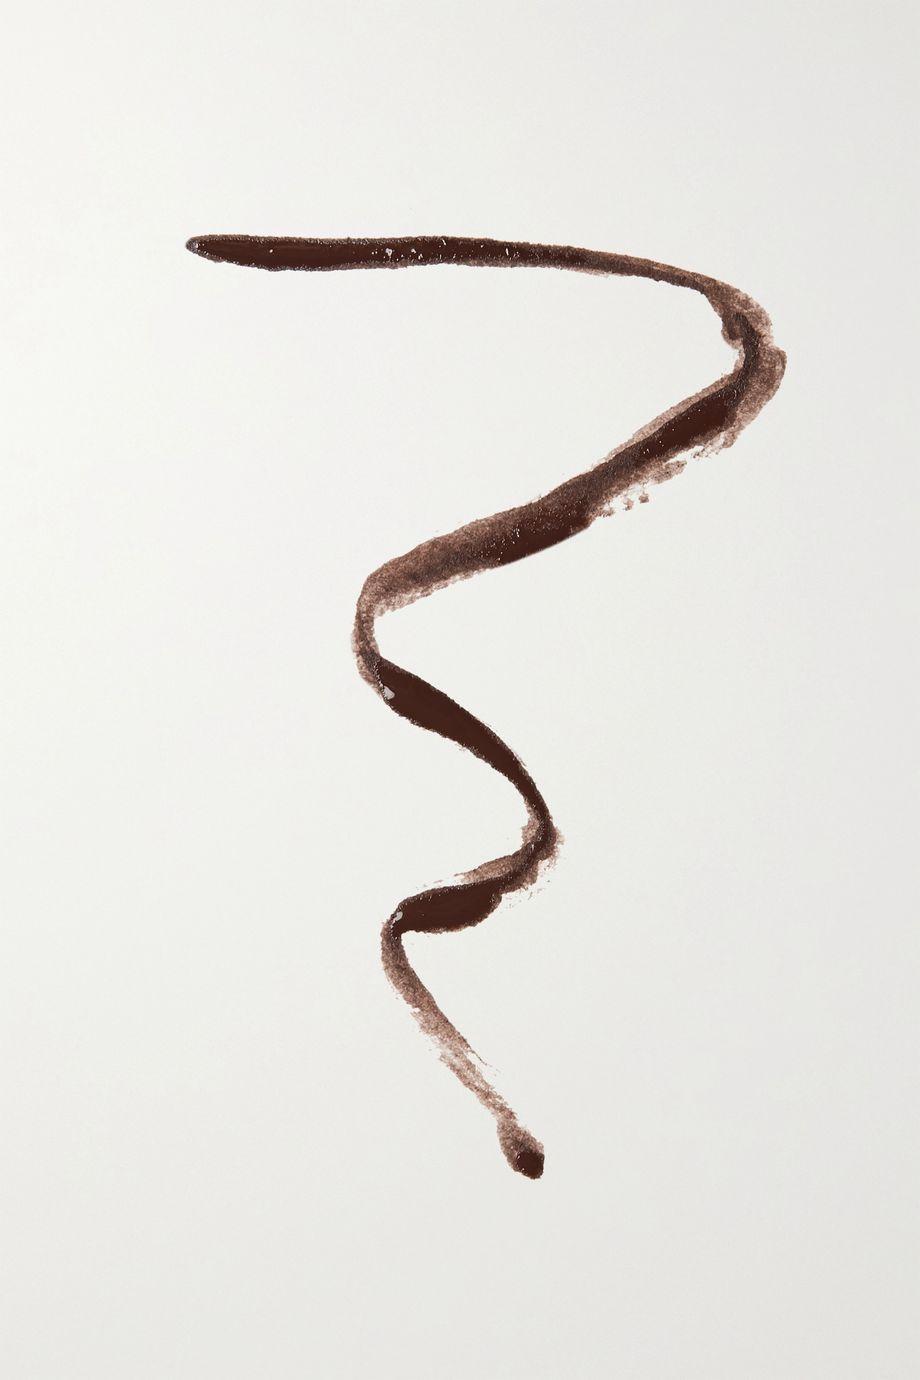 Marc Jacobs Beauty Highliner Liquid-Gel Eyeliner - Mo'cha 44